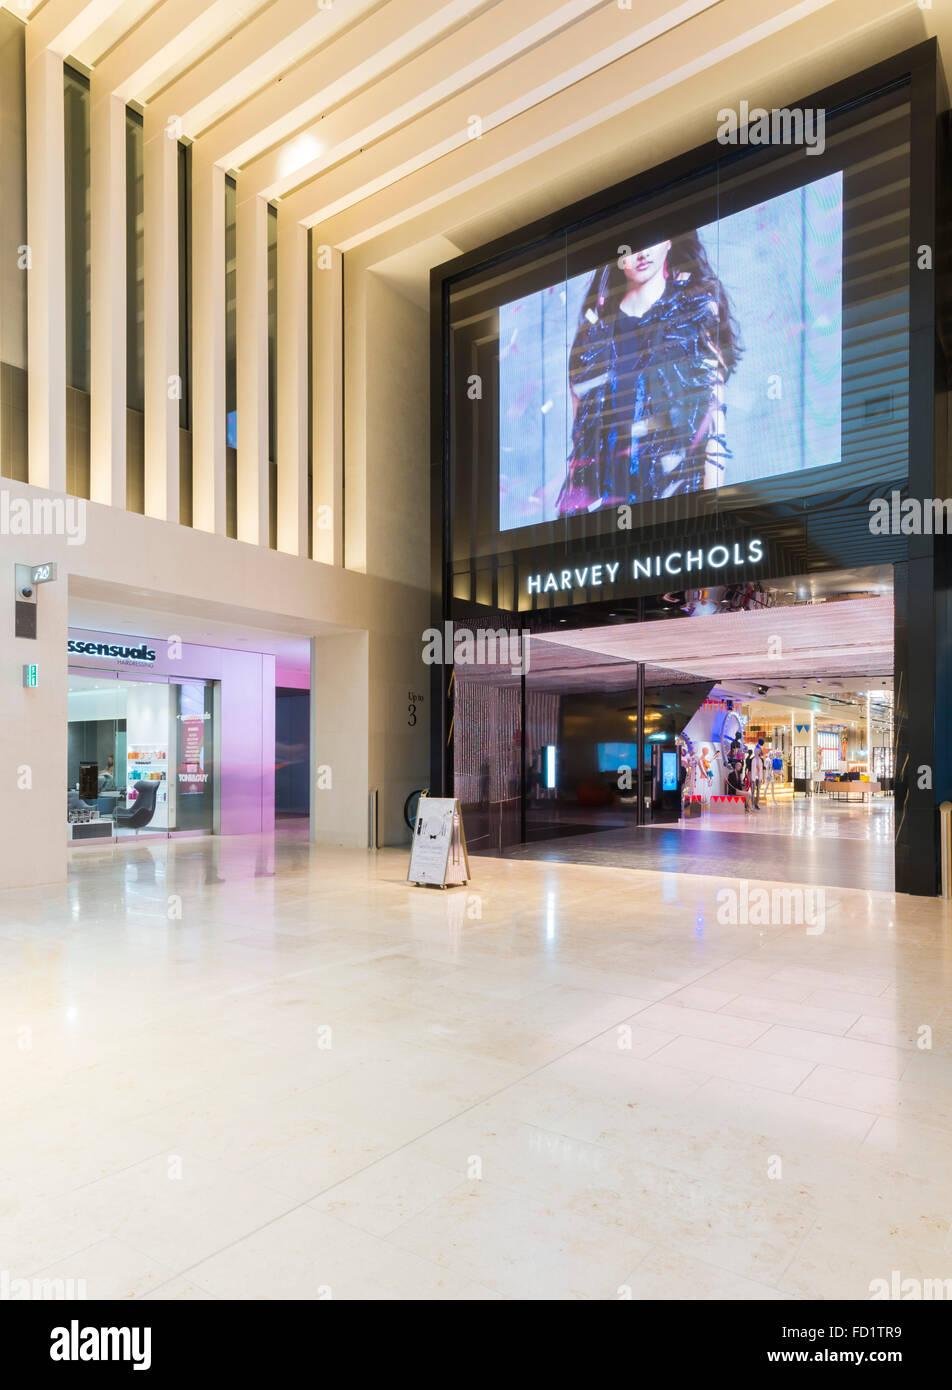 Harvy Nichols at The Mailbox shopping centre, Birmingham, England, UK. - Stock Image